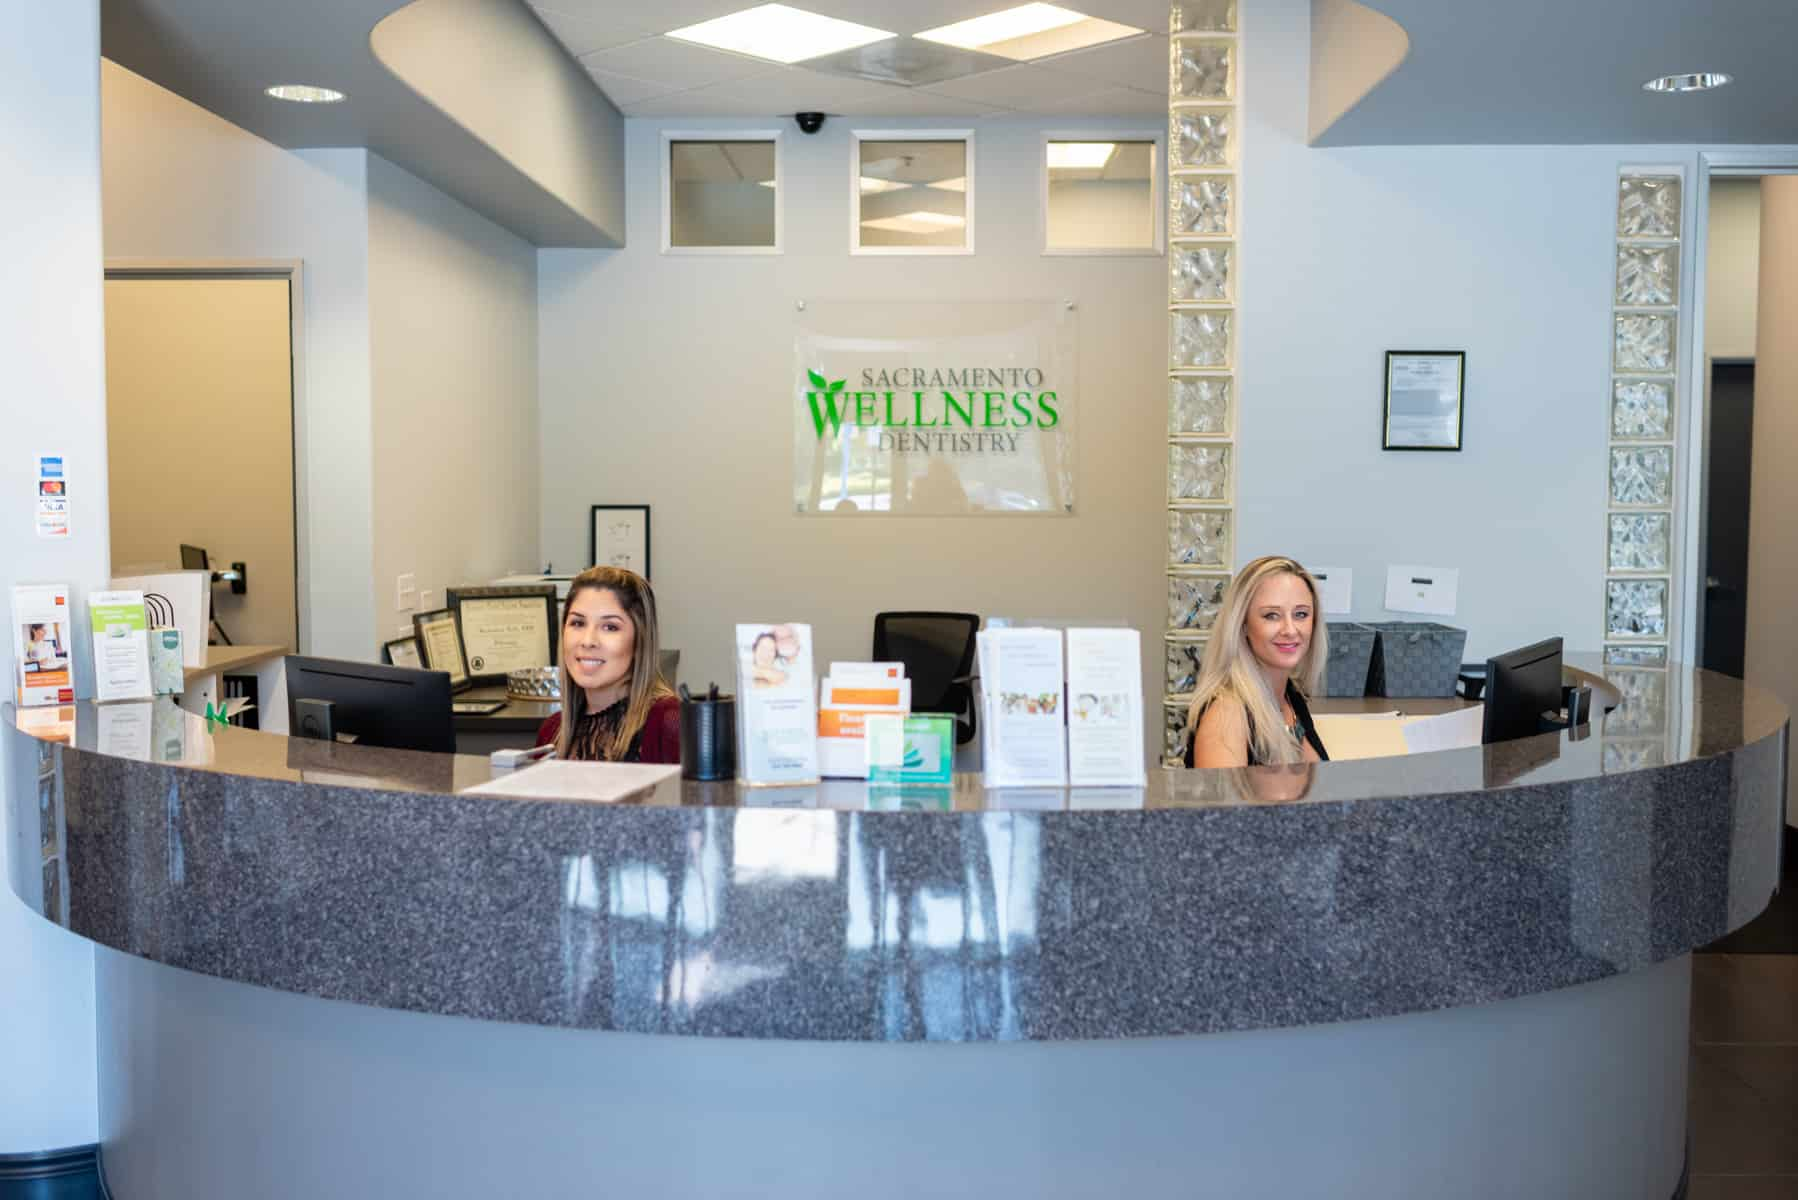 sacramento wellness orthodontics front desk